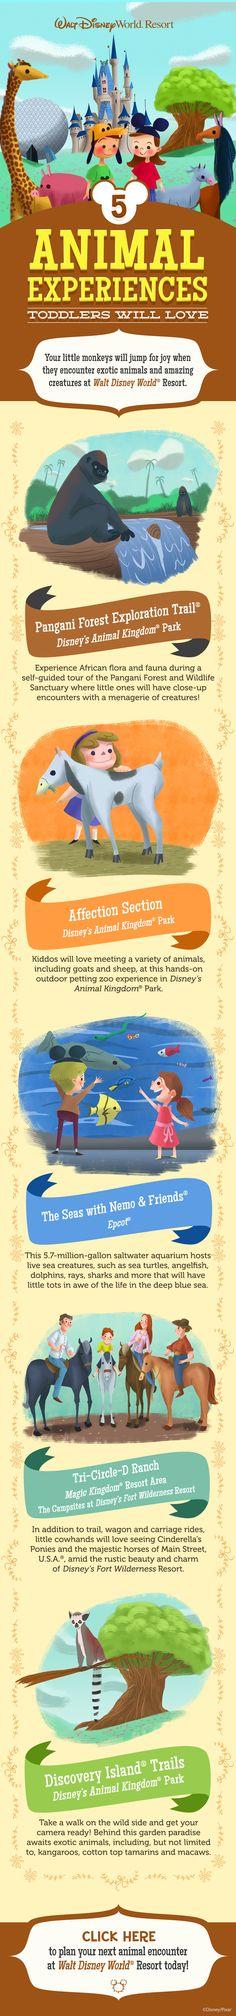 5 Animal Experiences Toddlers will Love at Walt Disney World! #vacation #DisneyKids #tips #tricks